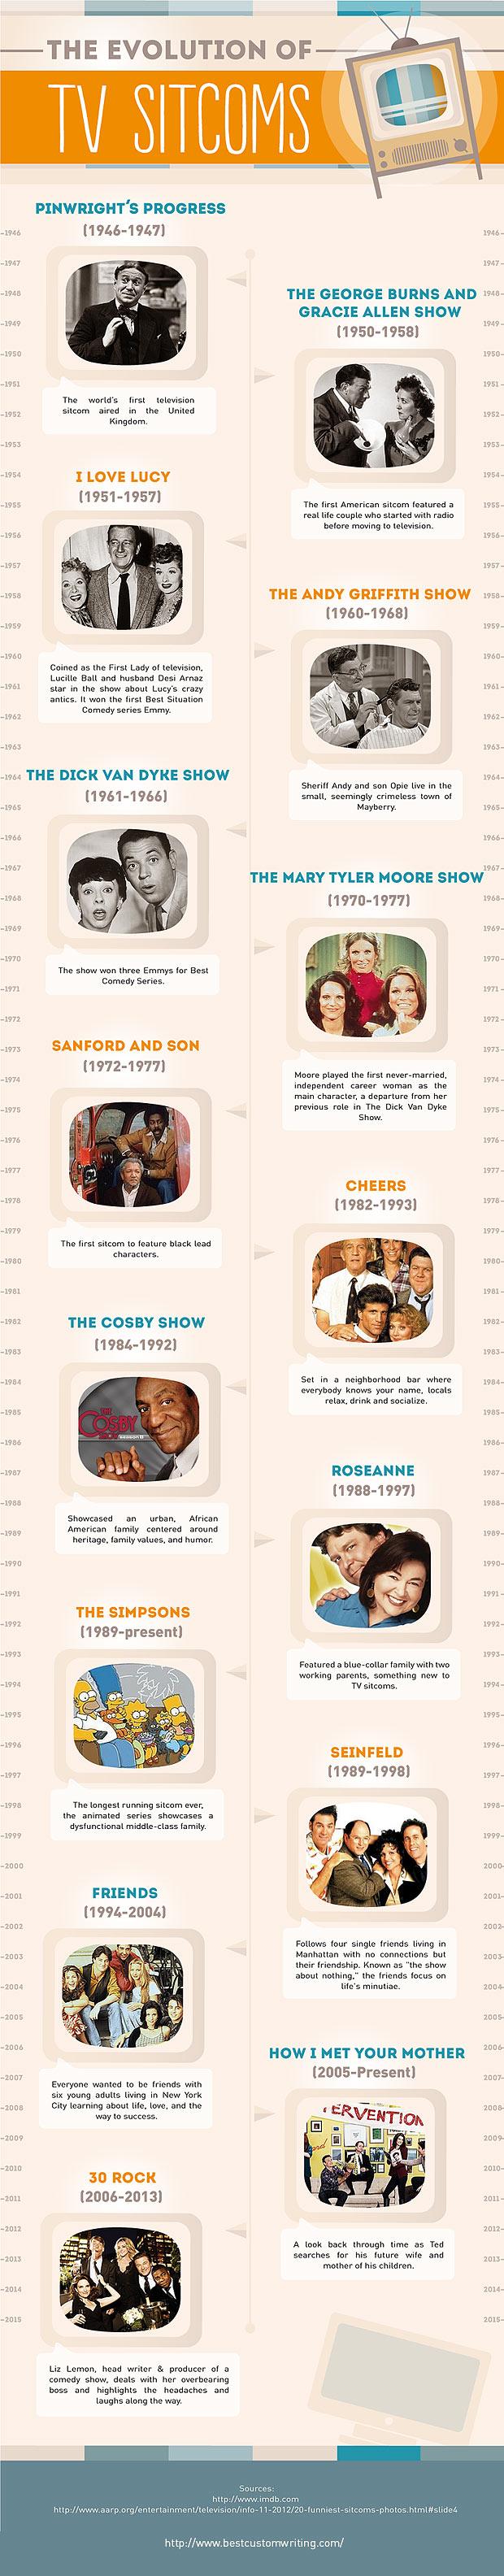 Evolution Of TV Sitcoms